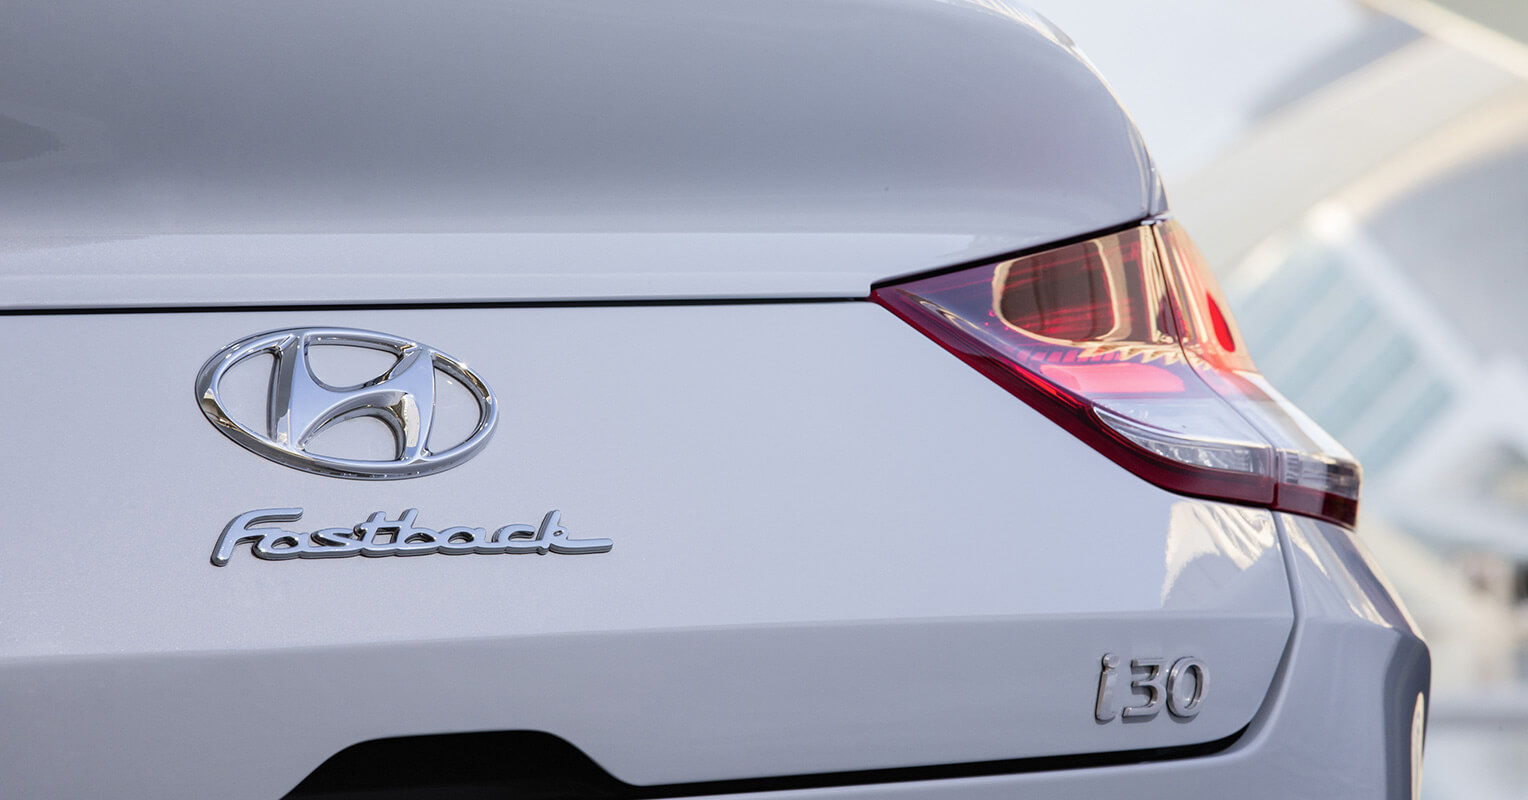 Portón trasero del Hyundai i30 Fastback 2018